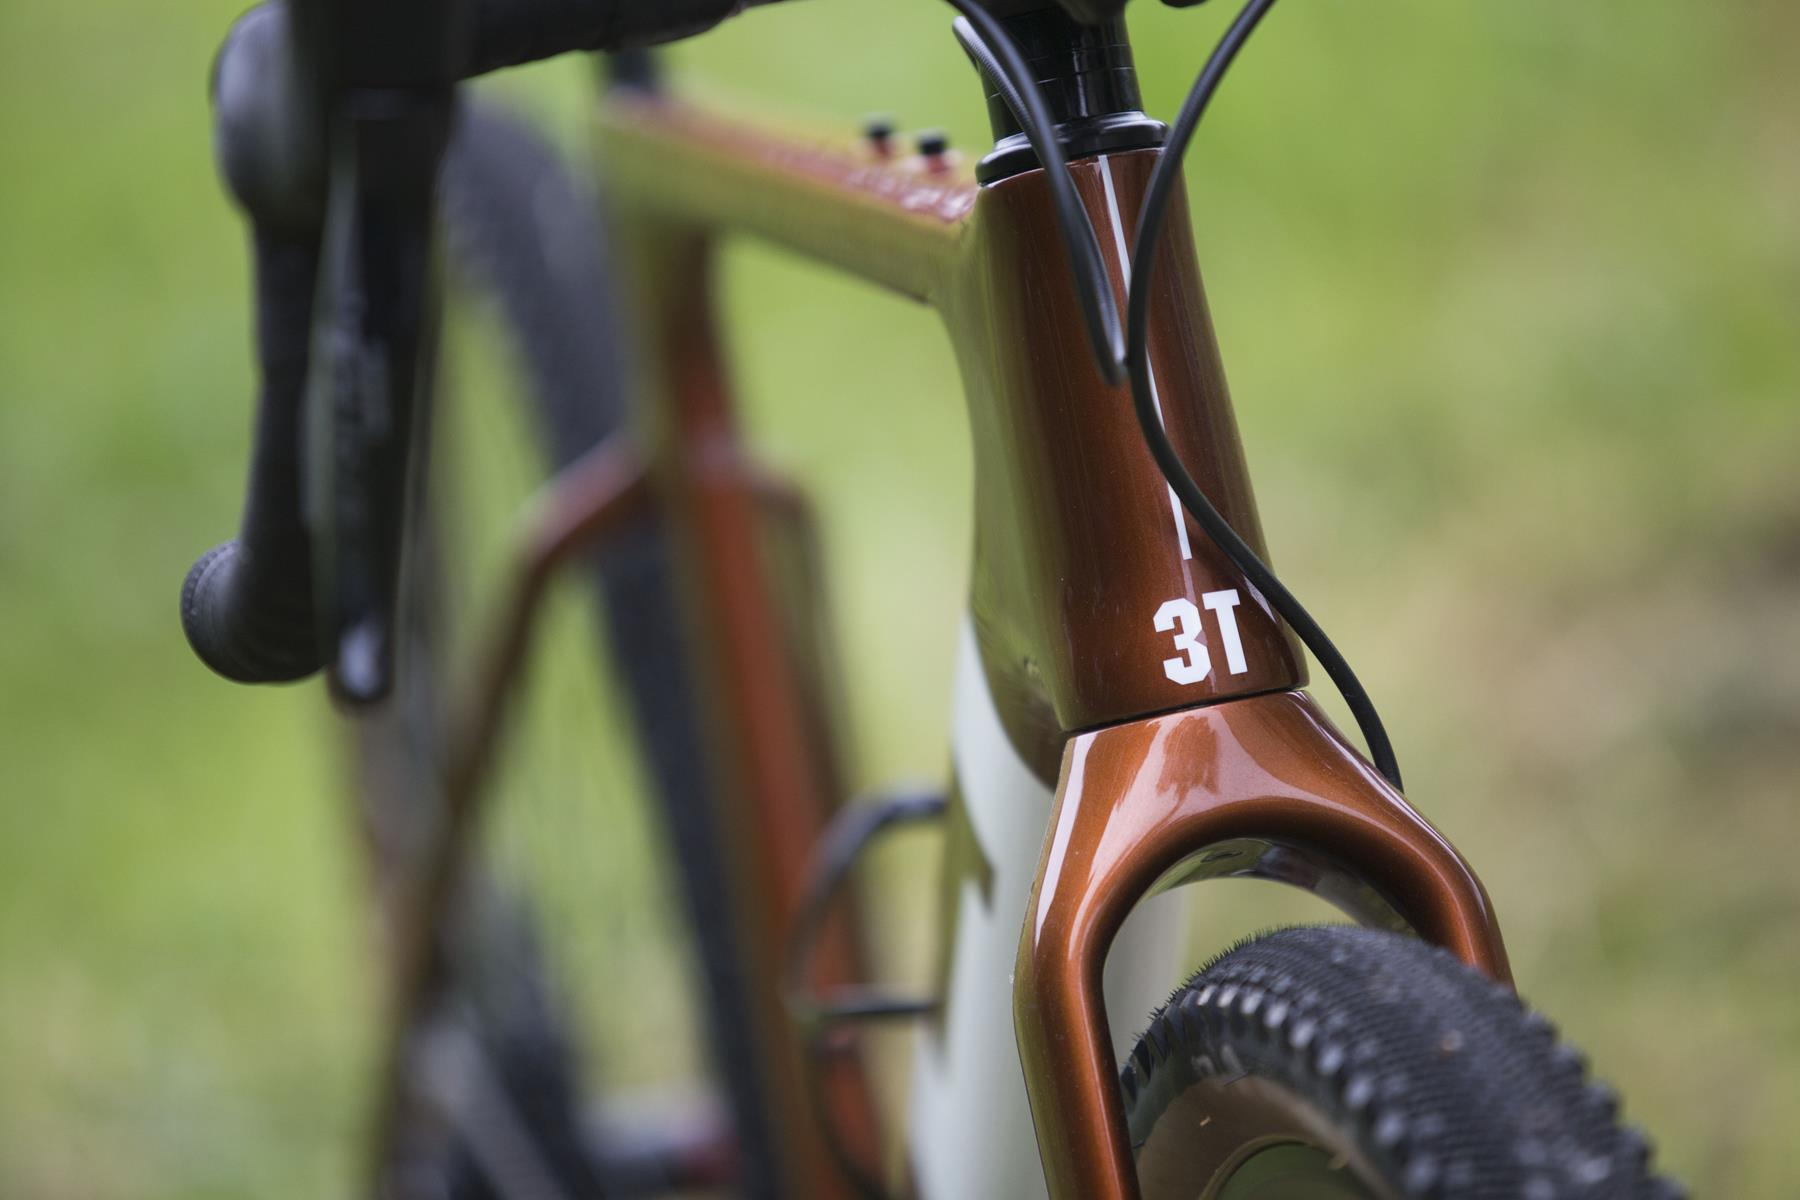 gravel_bicikl10.jpg (114 KB)